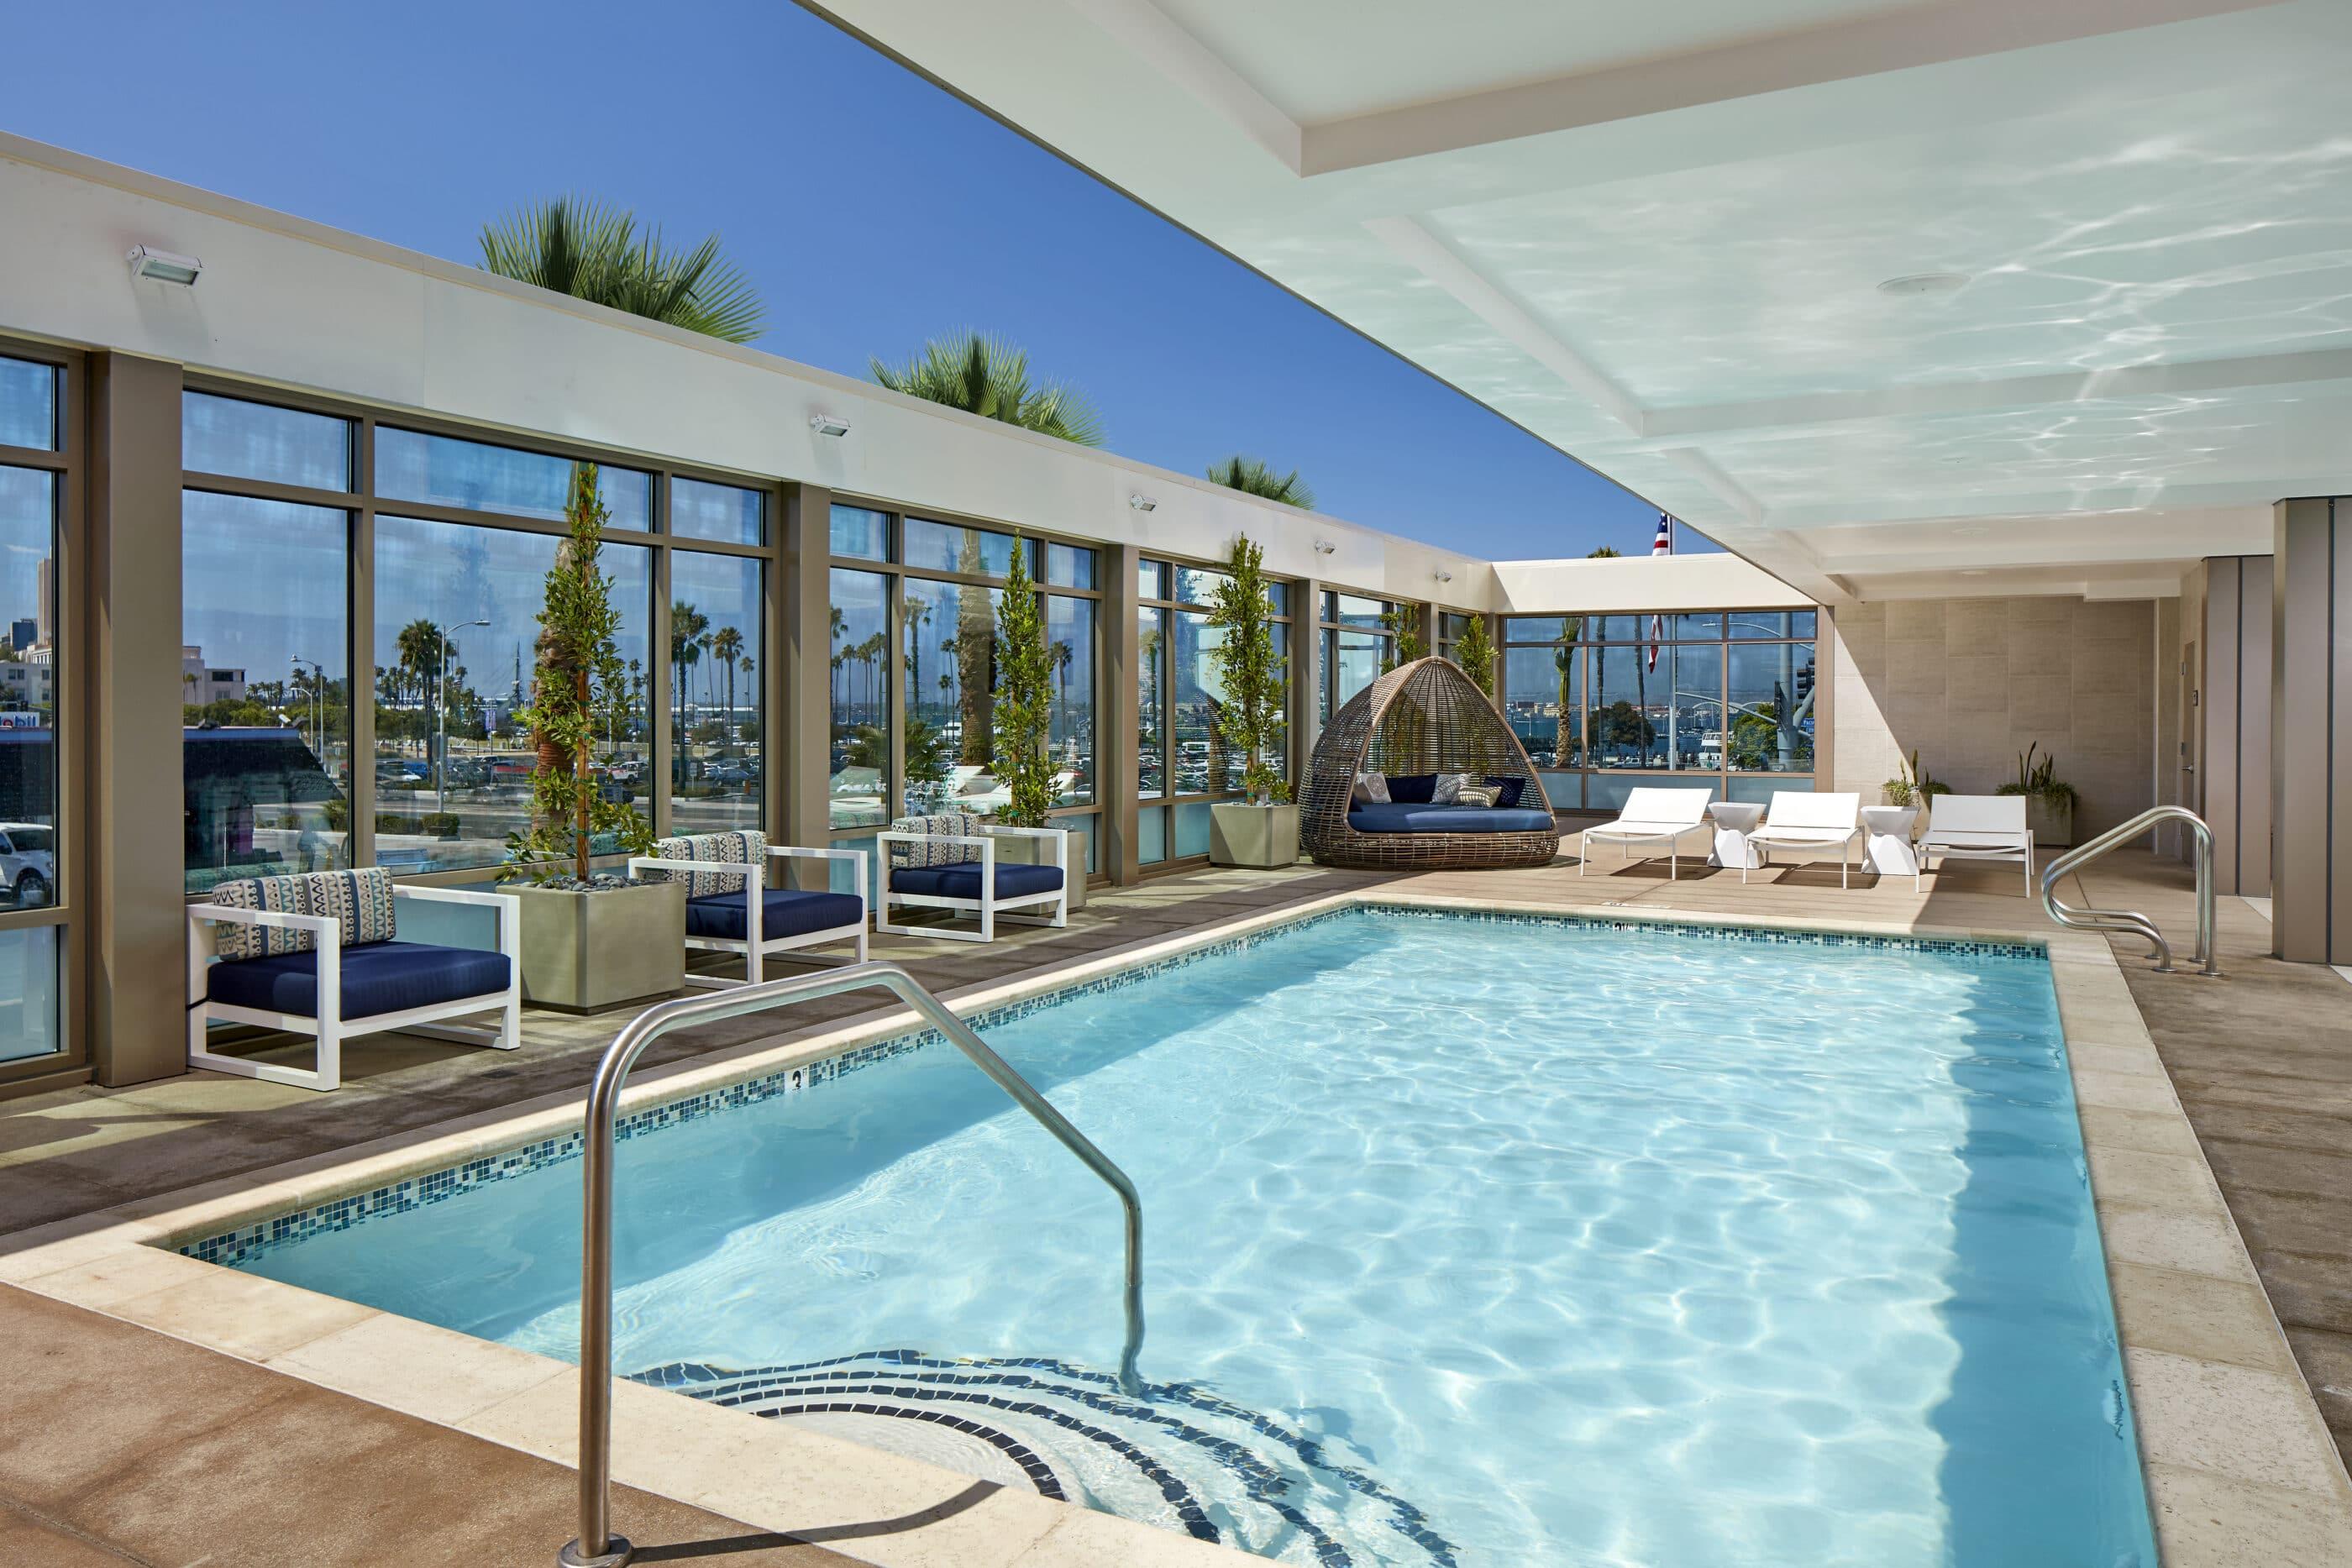 Hilton Garden Inn Bayside outdoor swimming pool